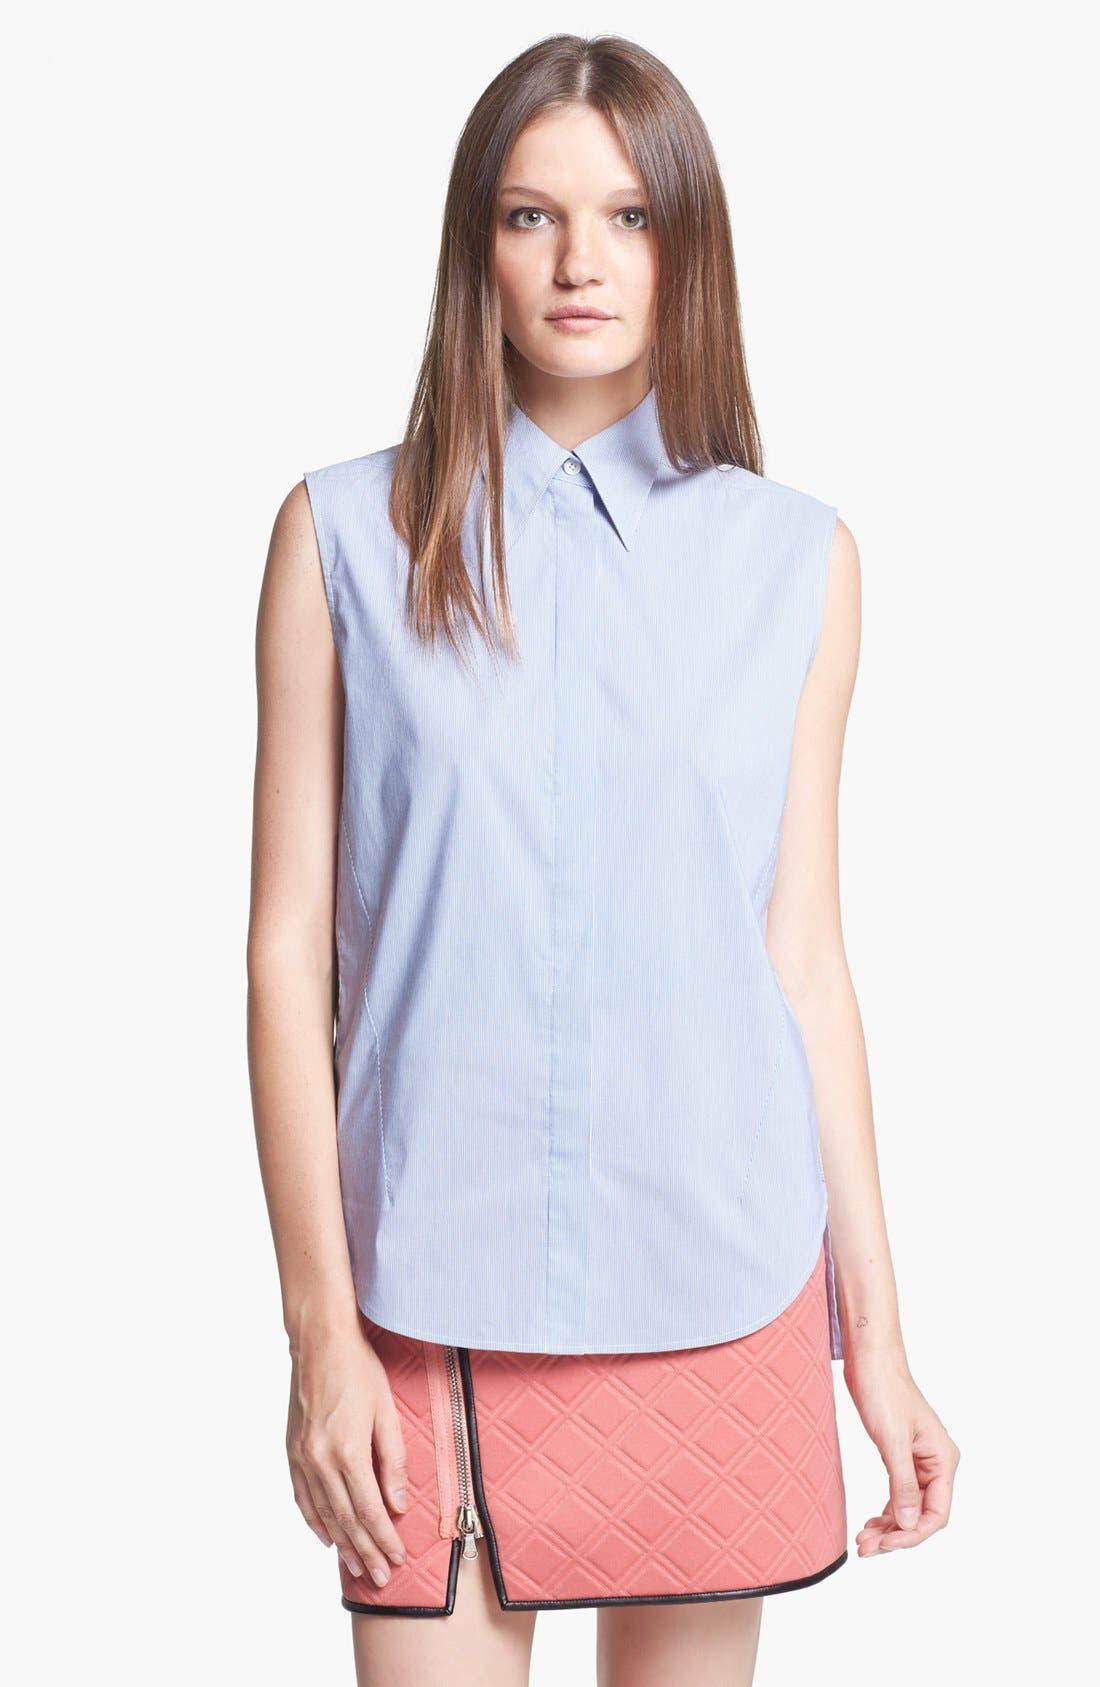 Alternate Image 1 Selected - 3.1 Phillip Lim Sleeveless Stripe Shirt